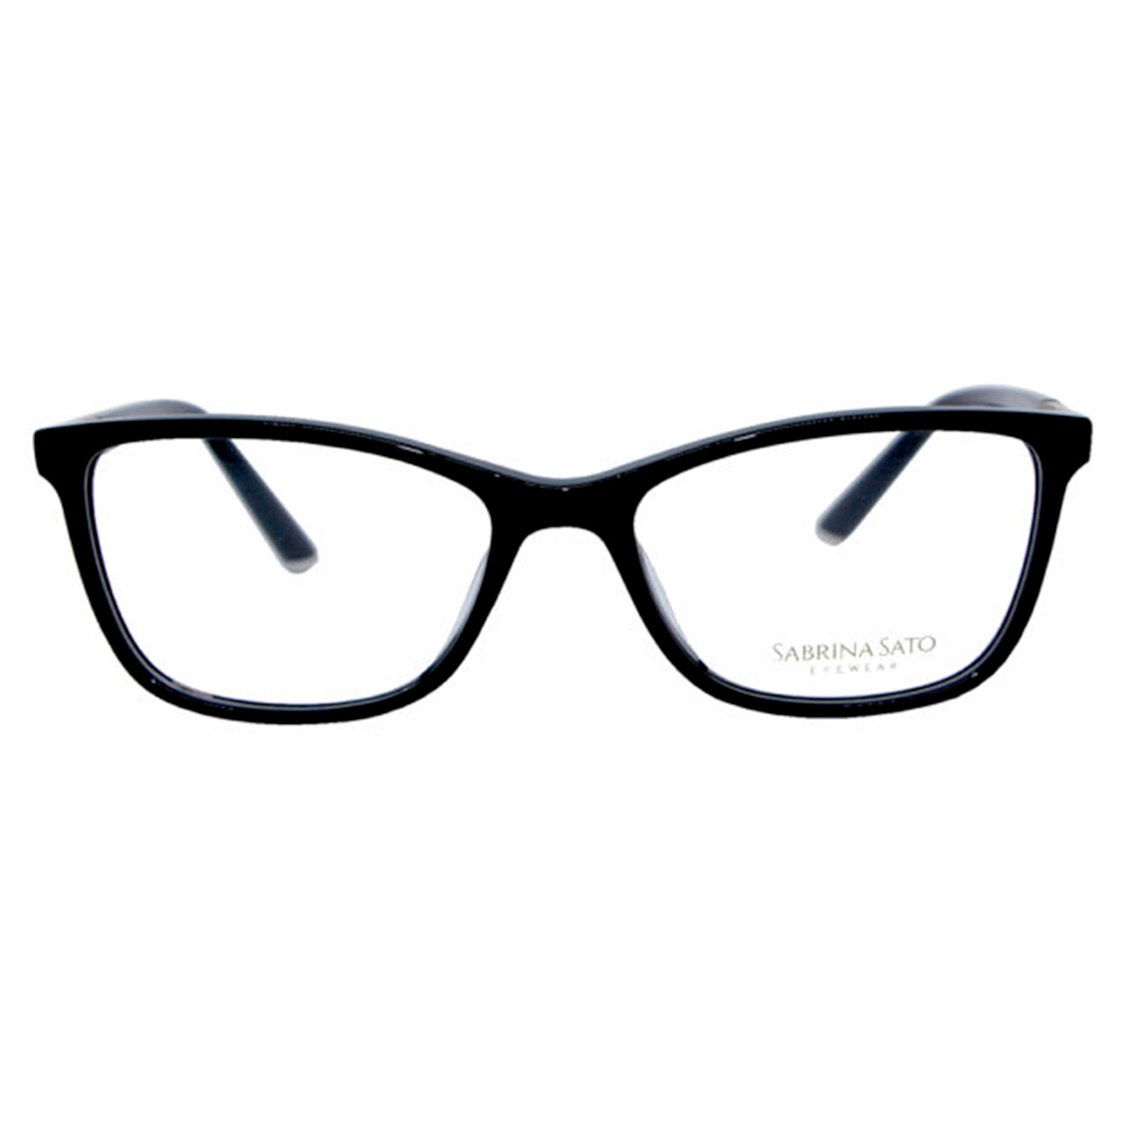 Óculos de Grau Sabrina Sato SS410 C1-53